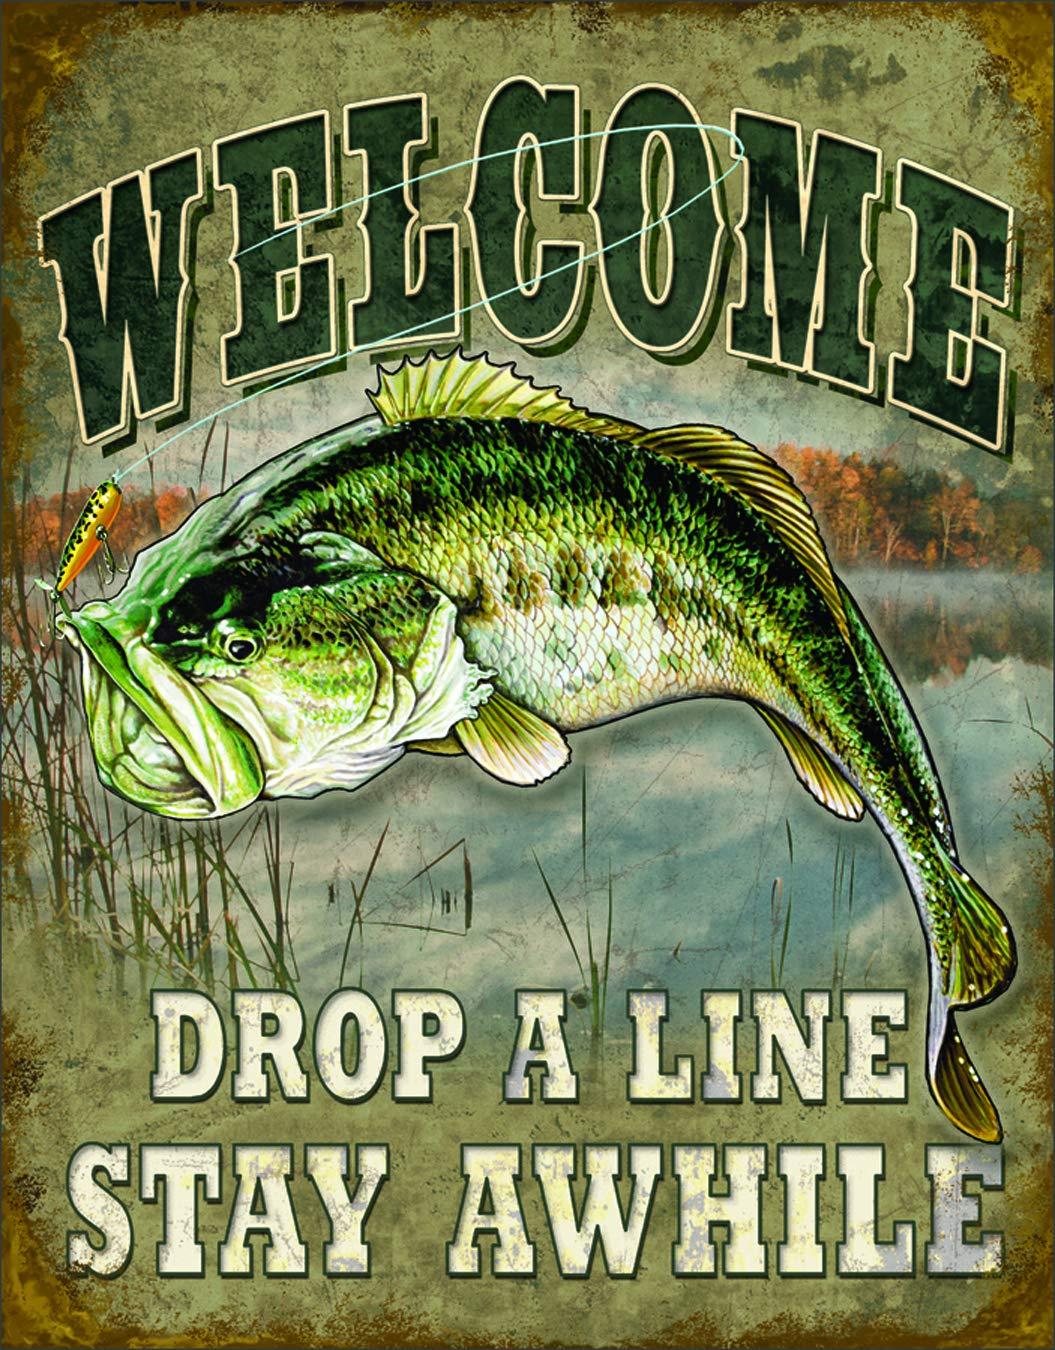 "Desperate Enterprises Welcome Bass Fishing Tin Sign, 12.5"" W x 16"" H"